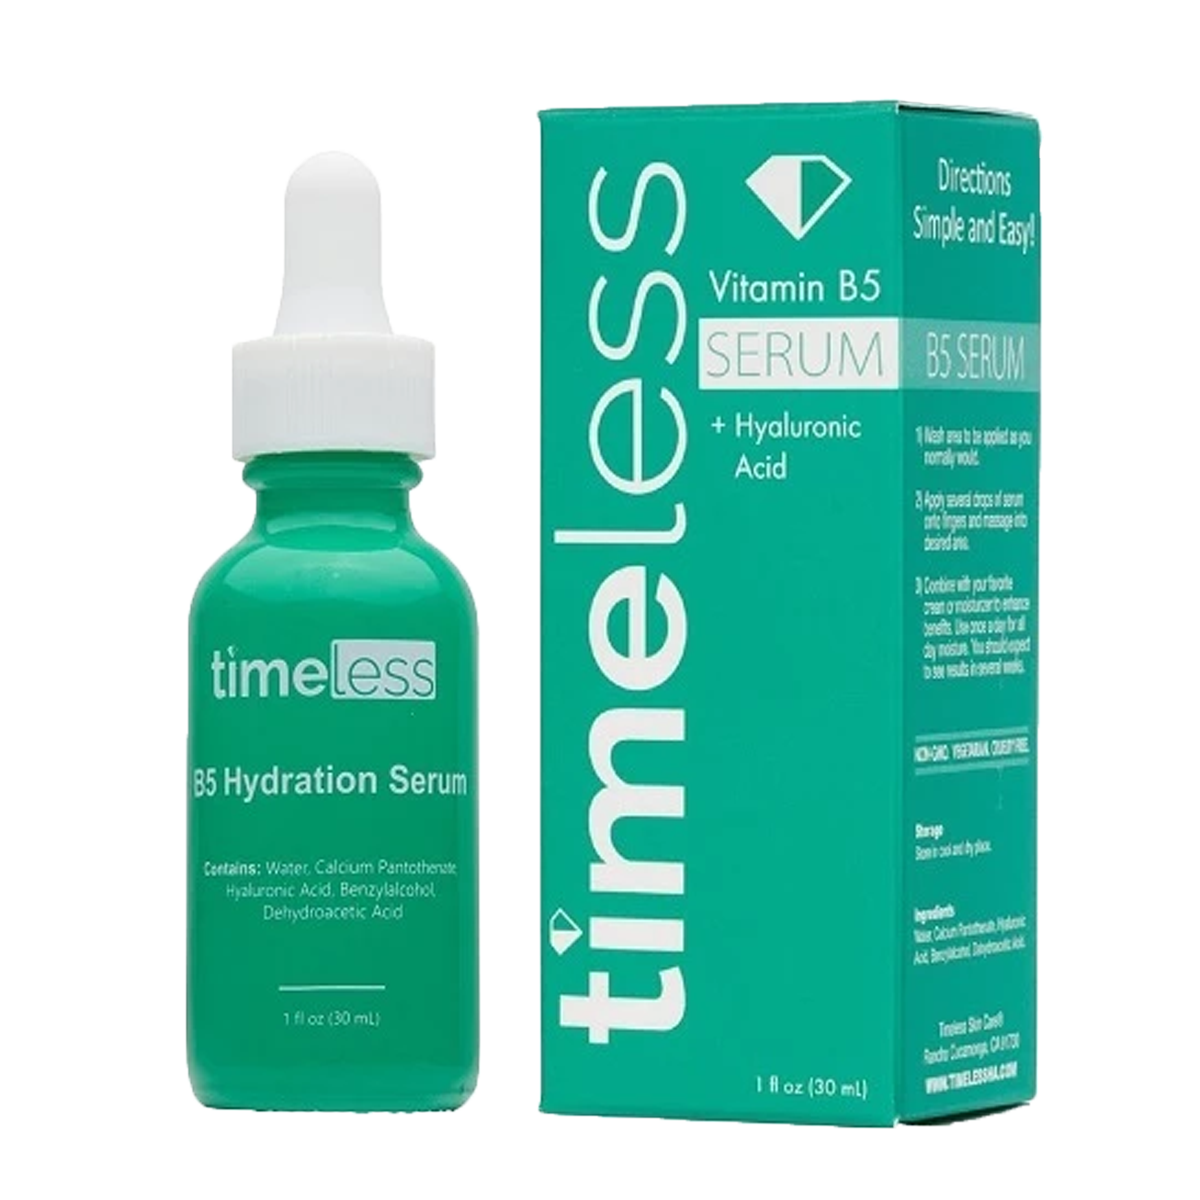 Timeless Vitamin B5 Serum